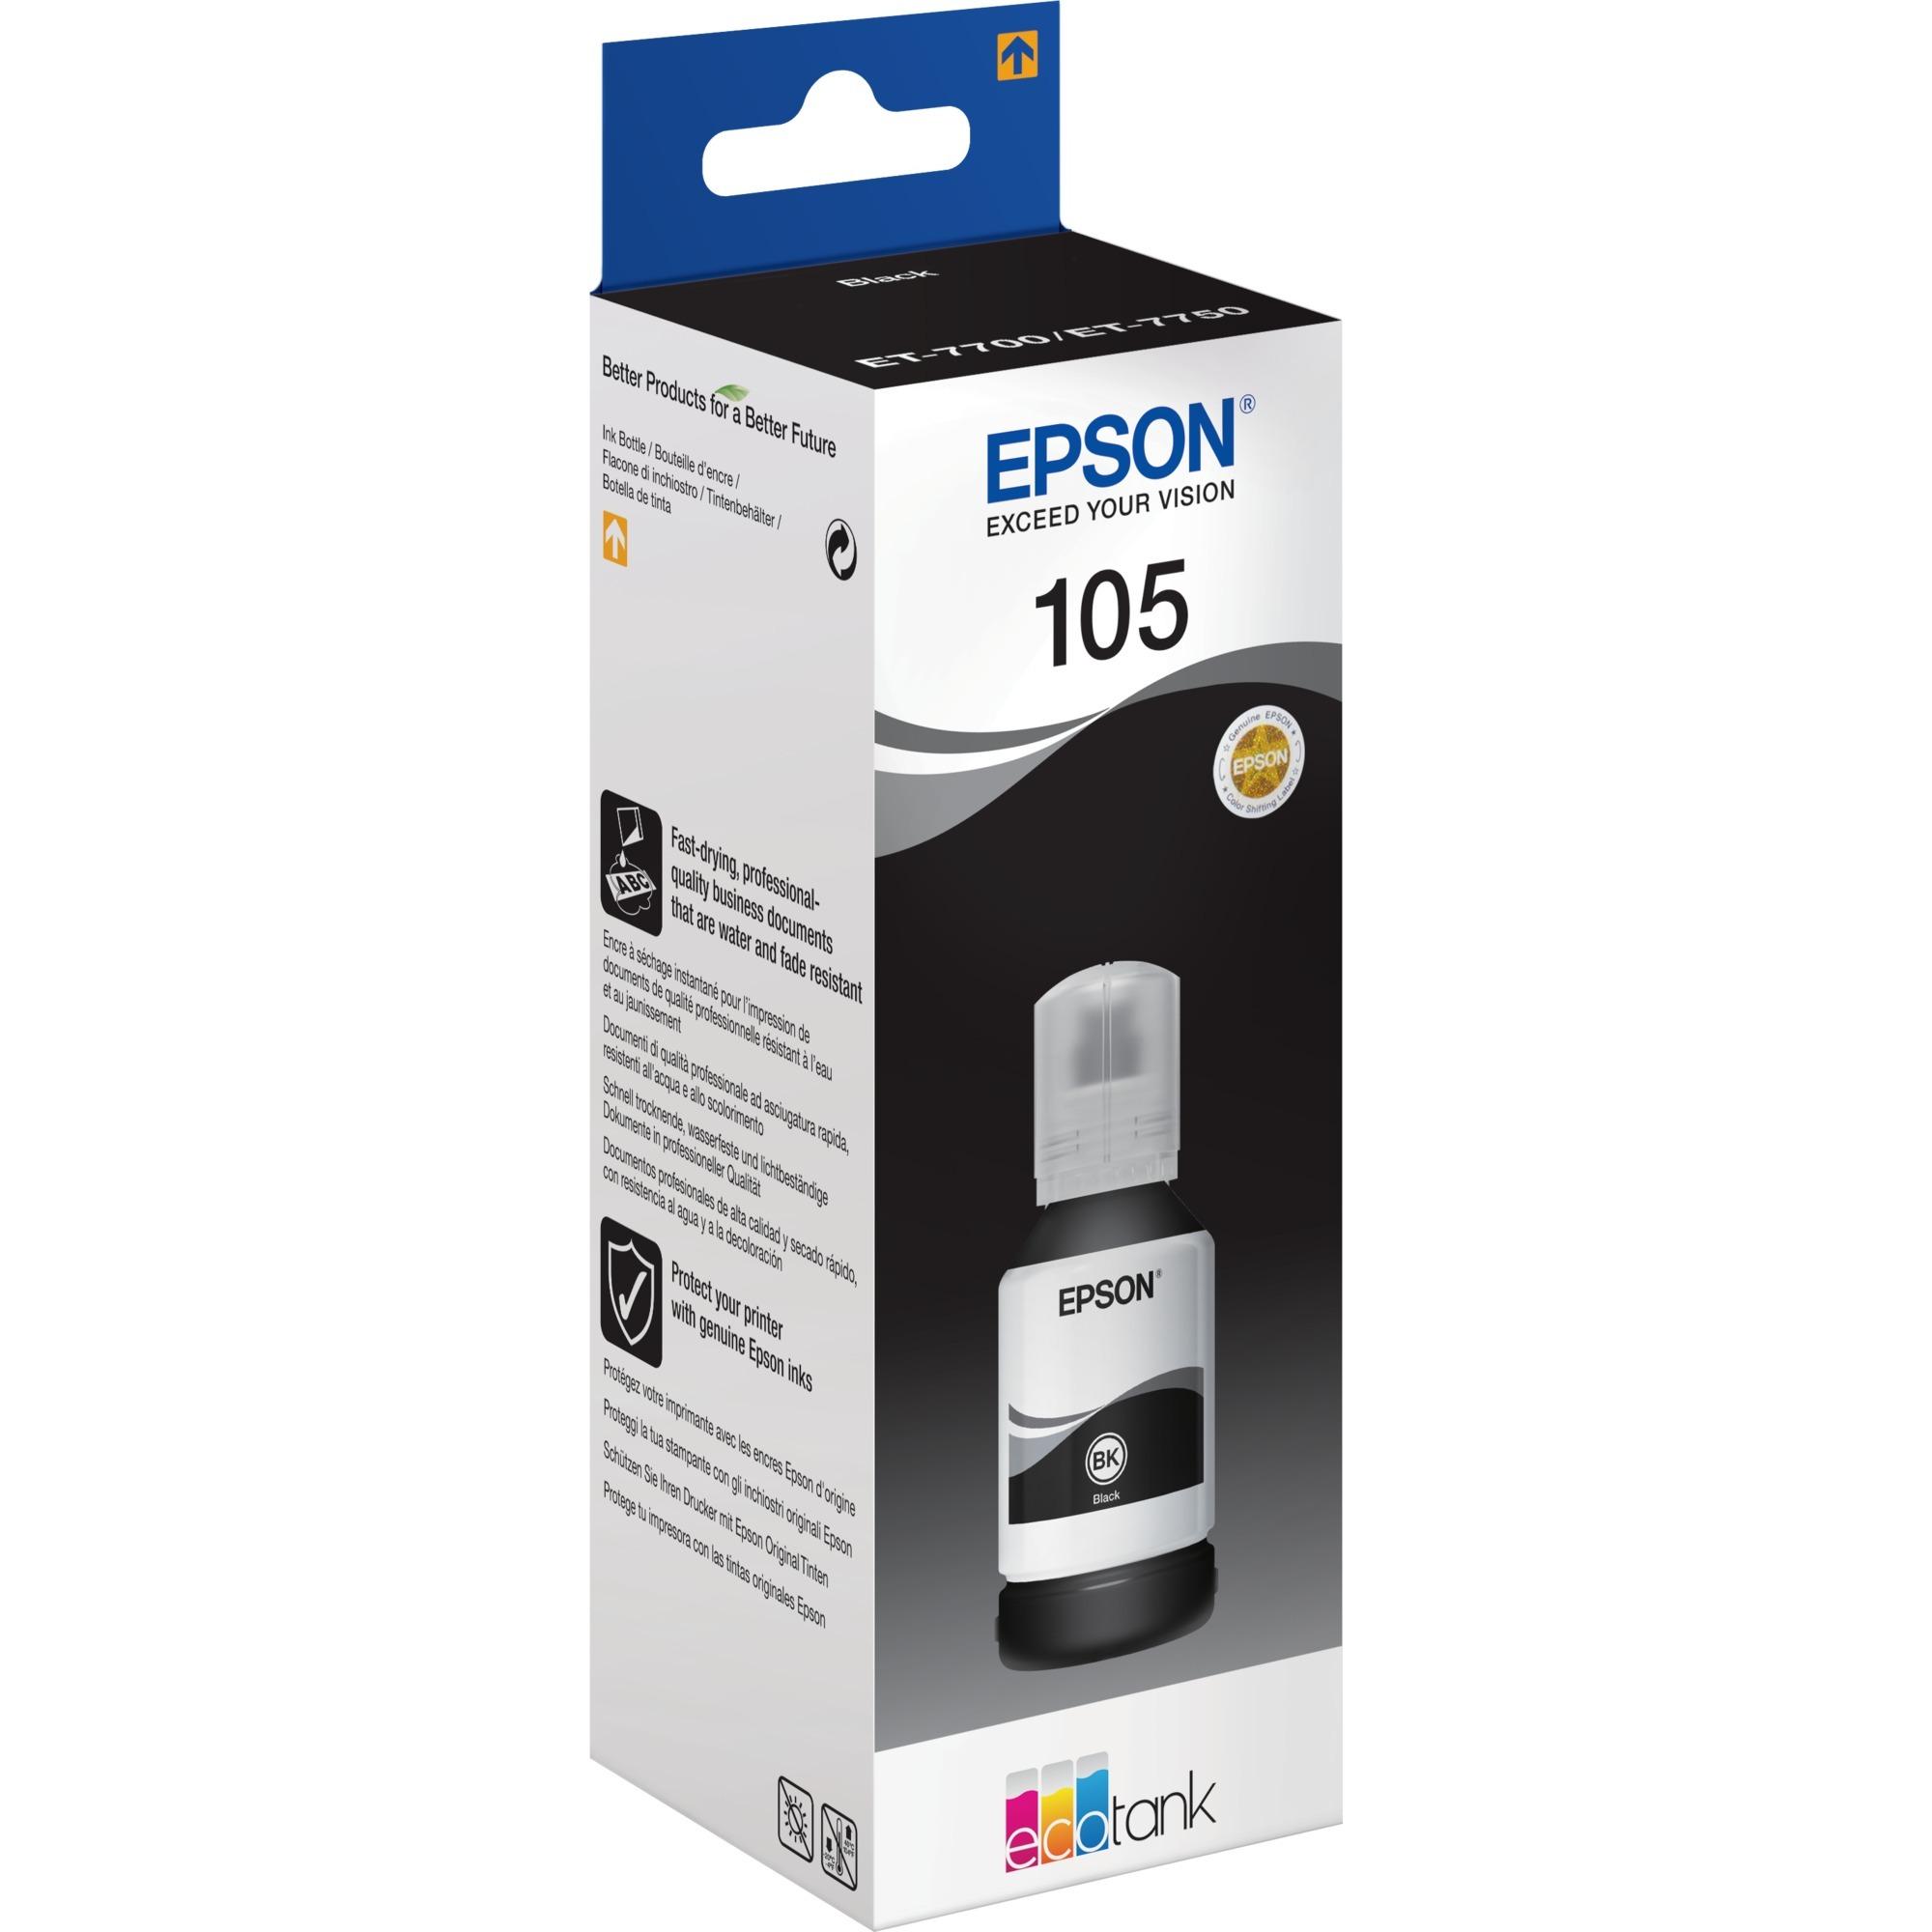 105 EcoTank Pigment Black ink bottle, Tinta